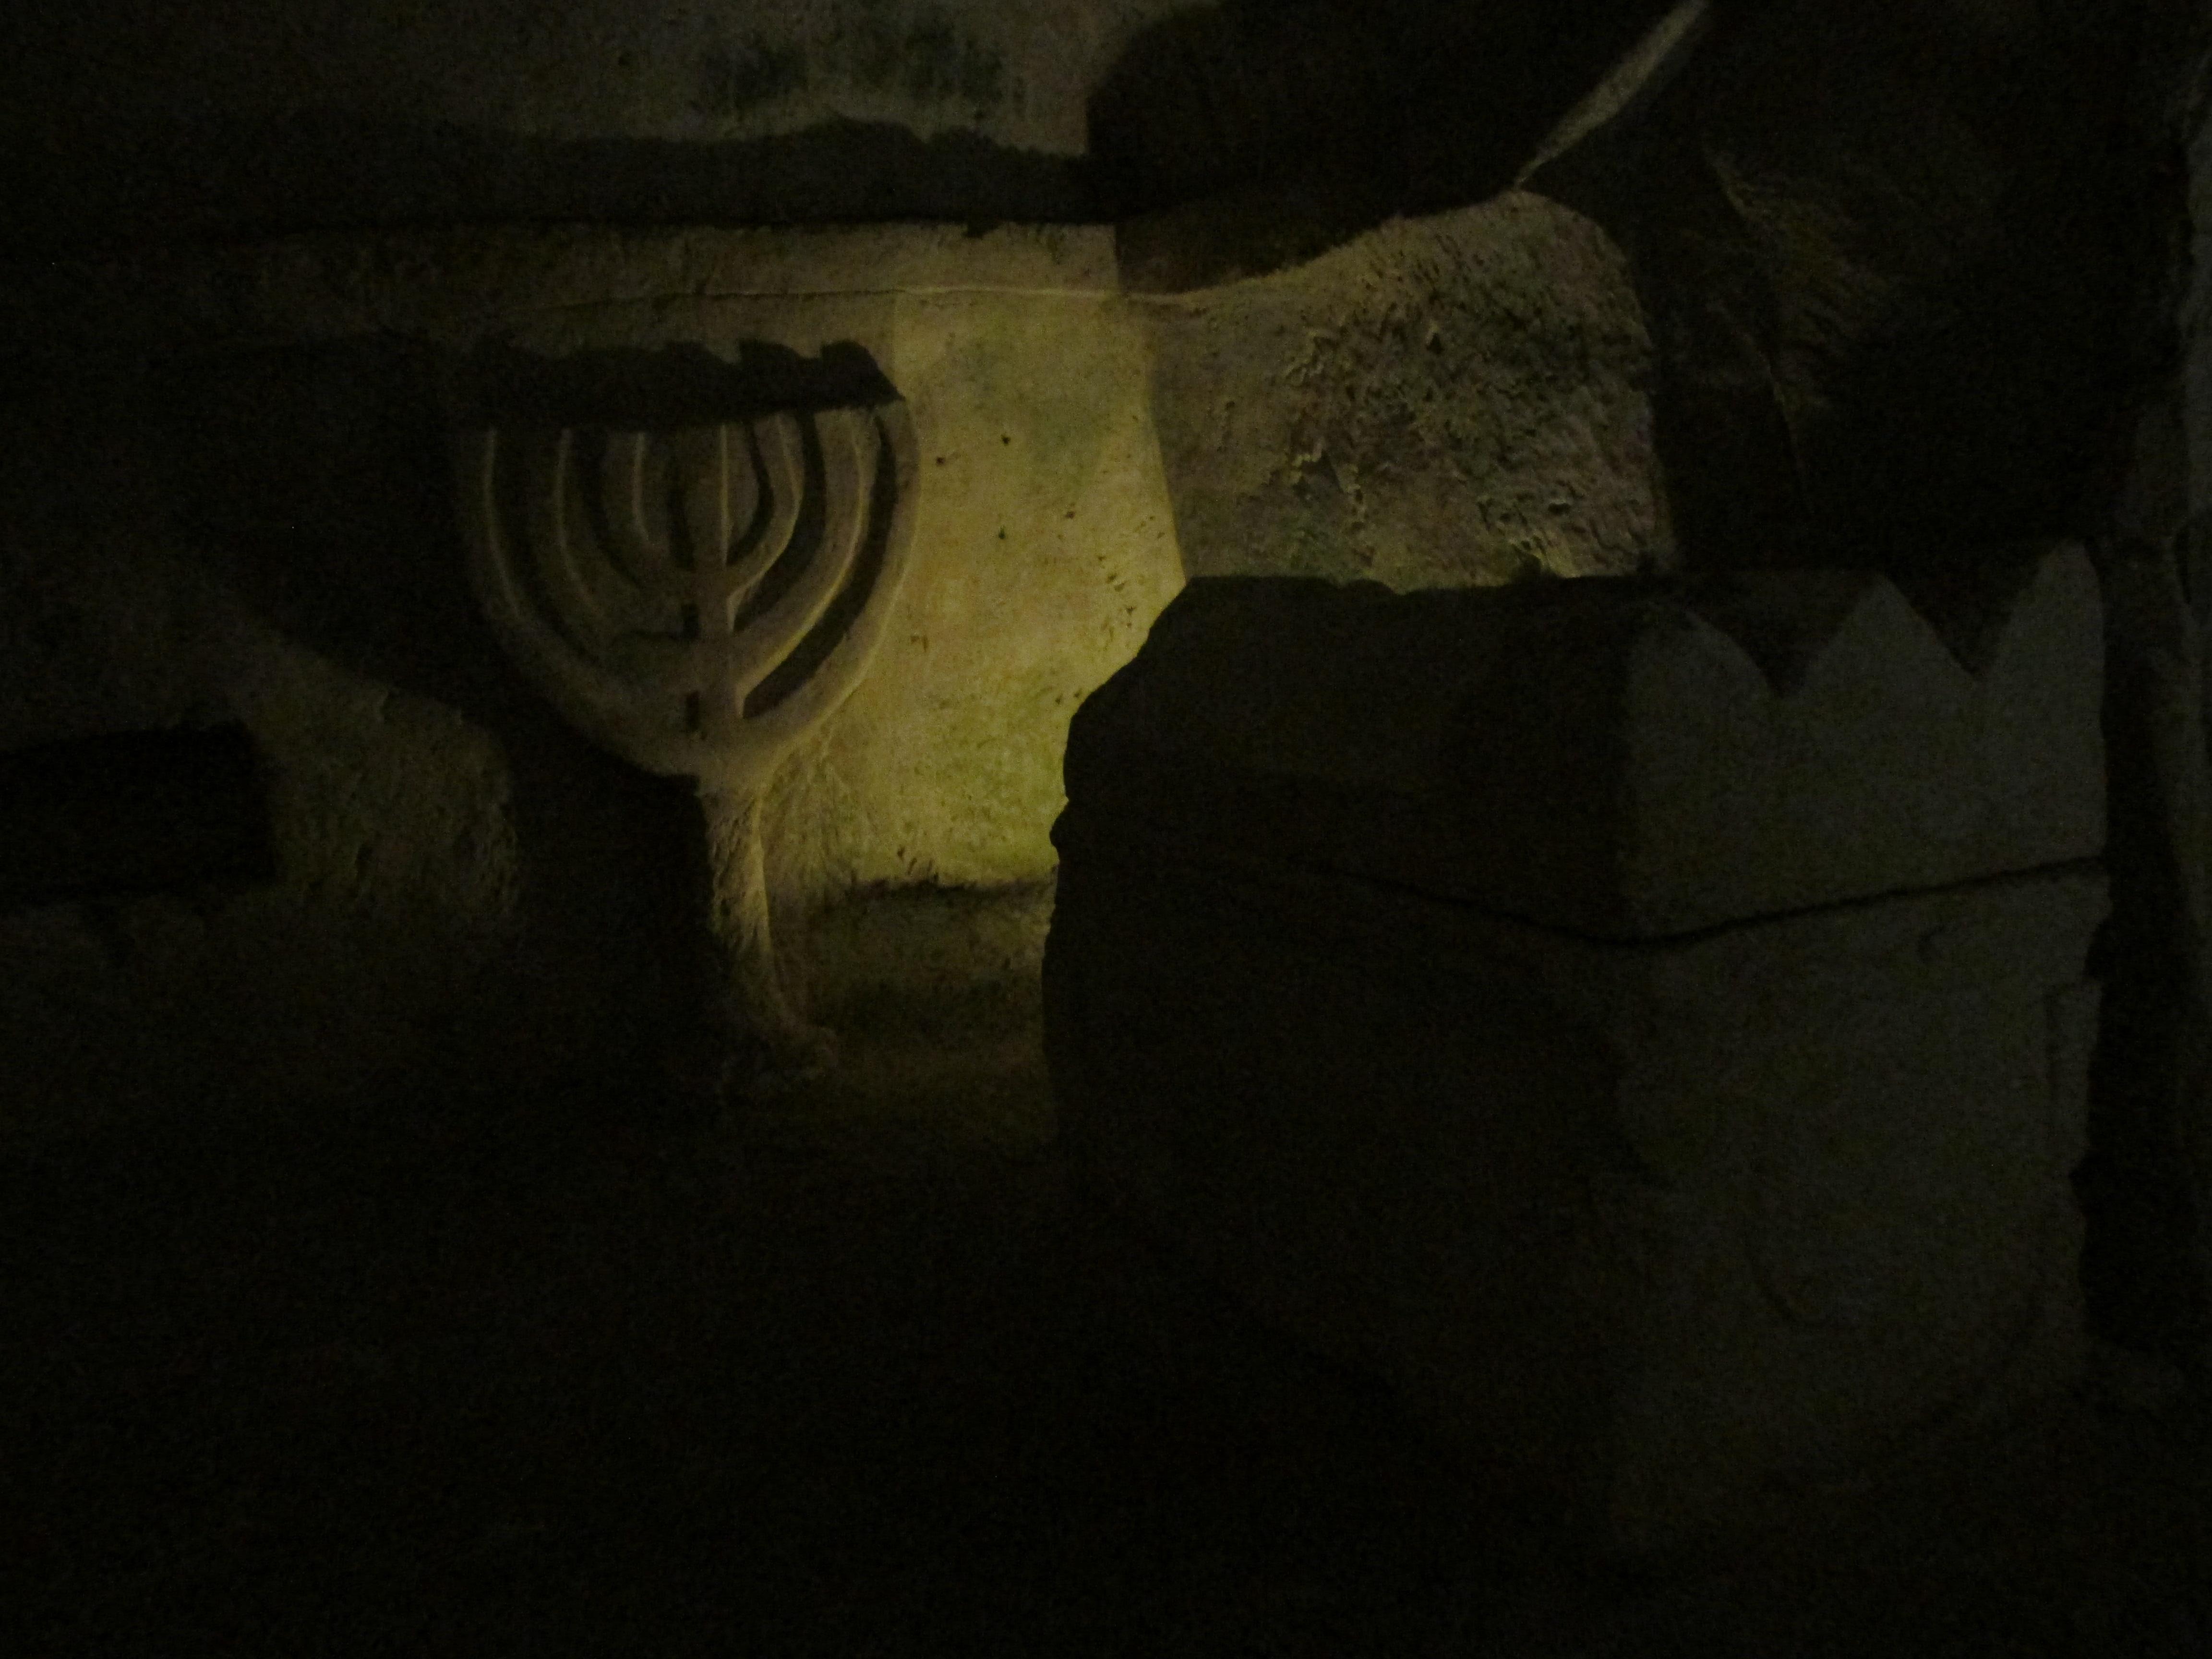 Man Cave Bet Wiki : File bet shearim cave of coffins menorah g wikimedia